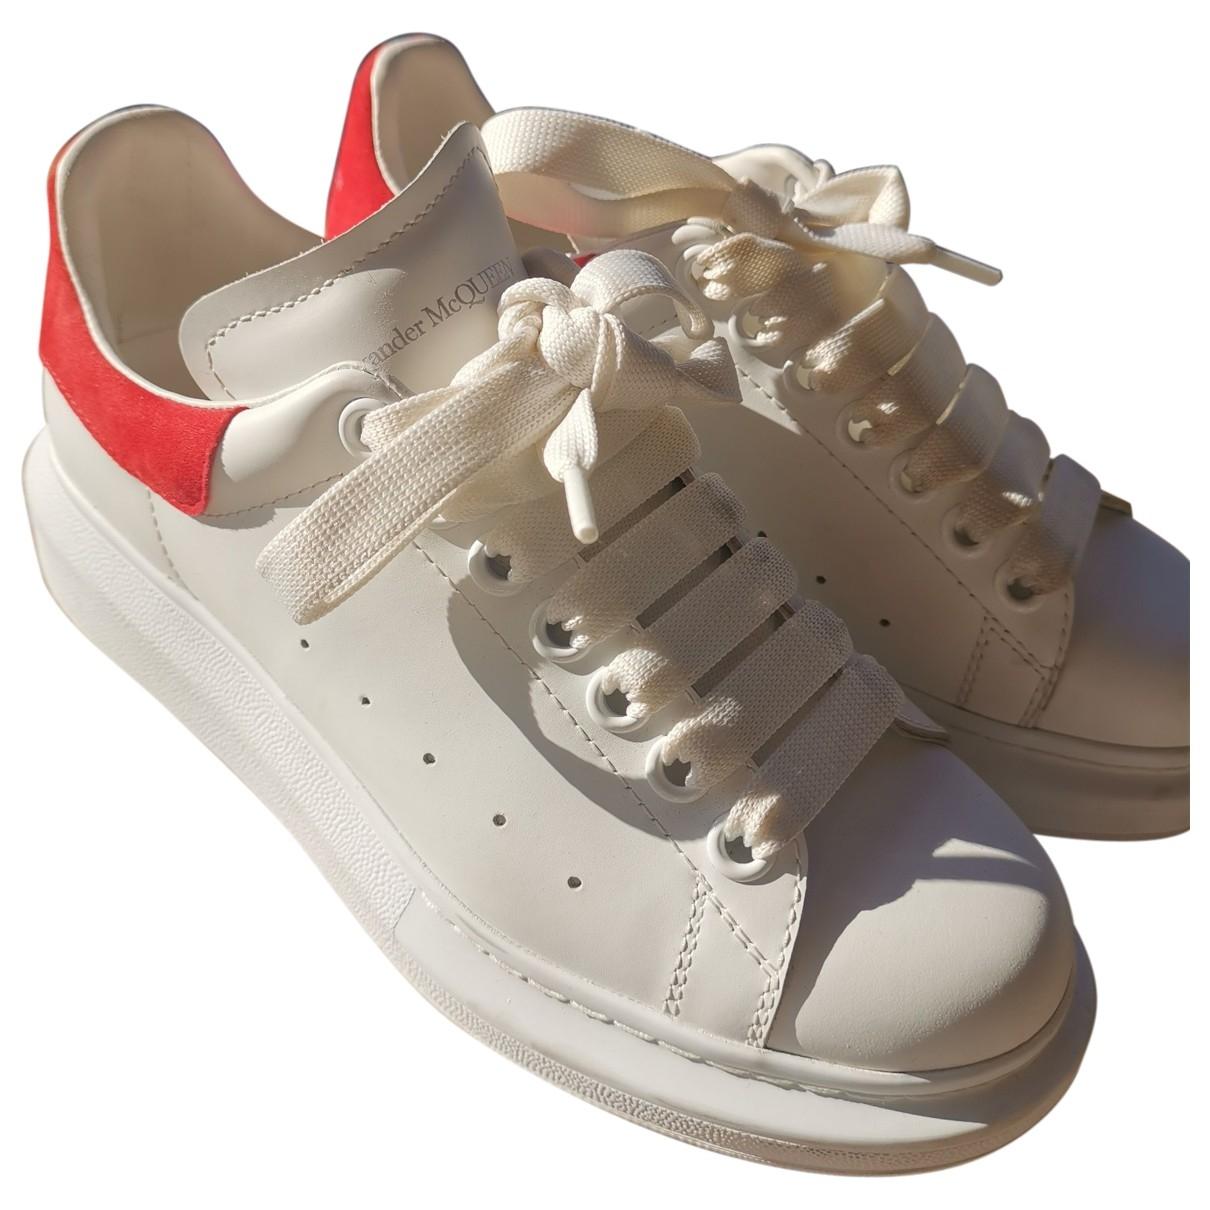 Alexander Mcqueen - Baskets Oversize pour femme en cuir - rouge